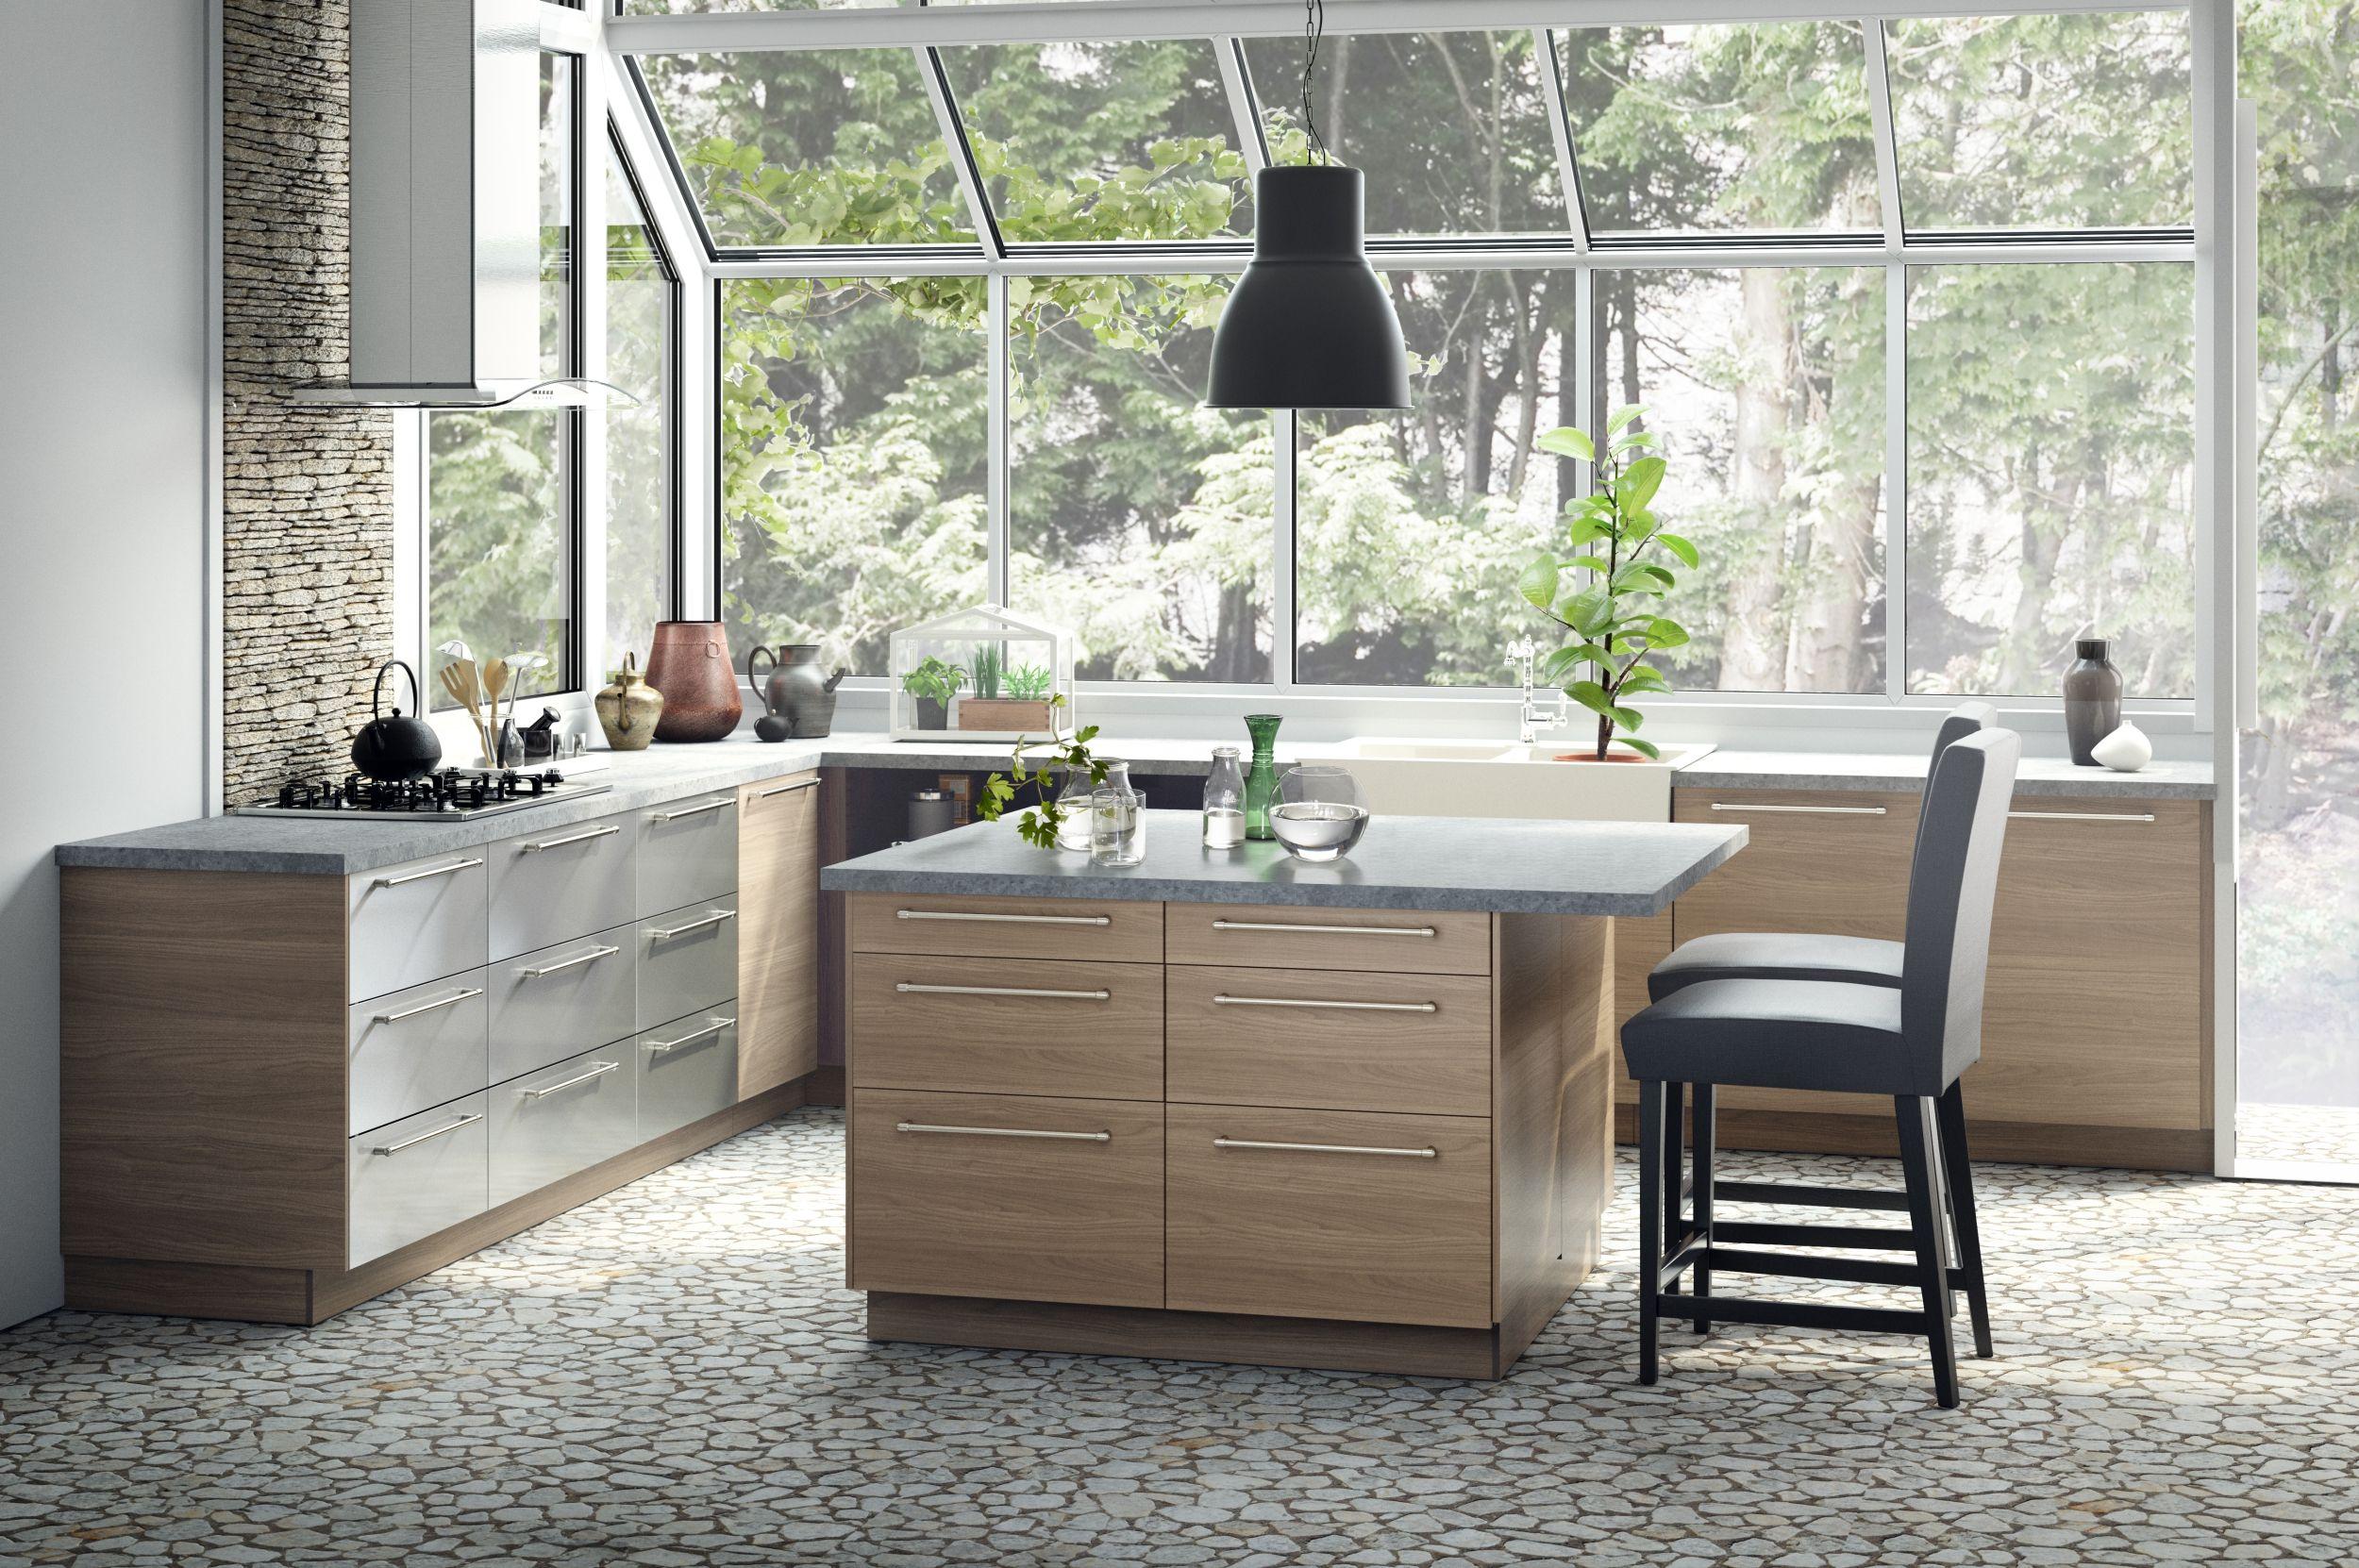 Küchenrückwand Ikea ~ Metod keuken ikea ikeanl industrieel stijlen keukensysteem